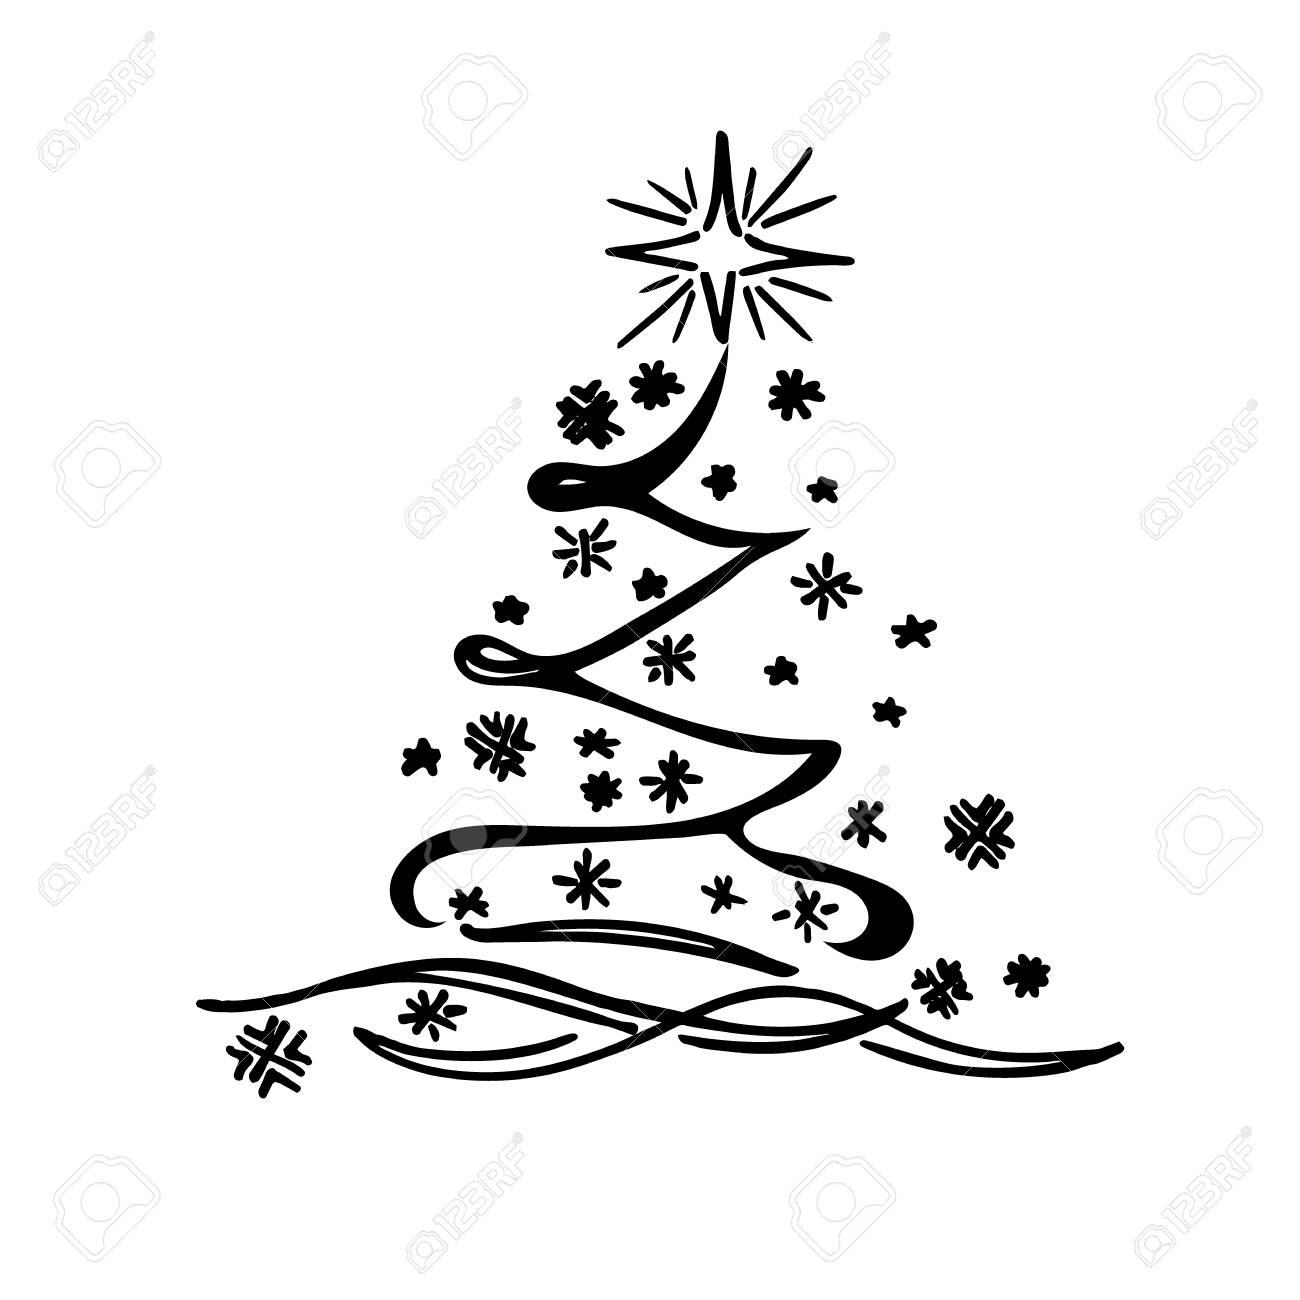 Christmas tree sketch vector stock vector 54729638